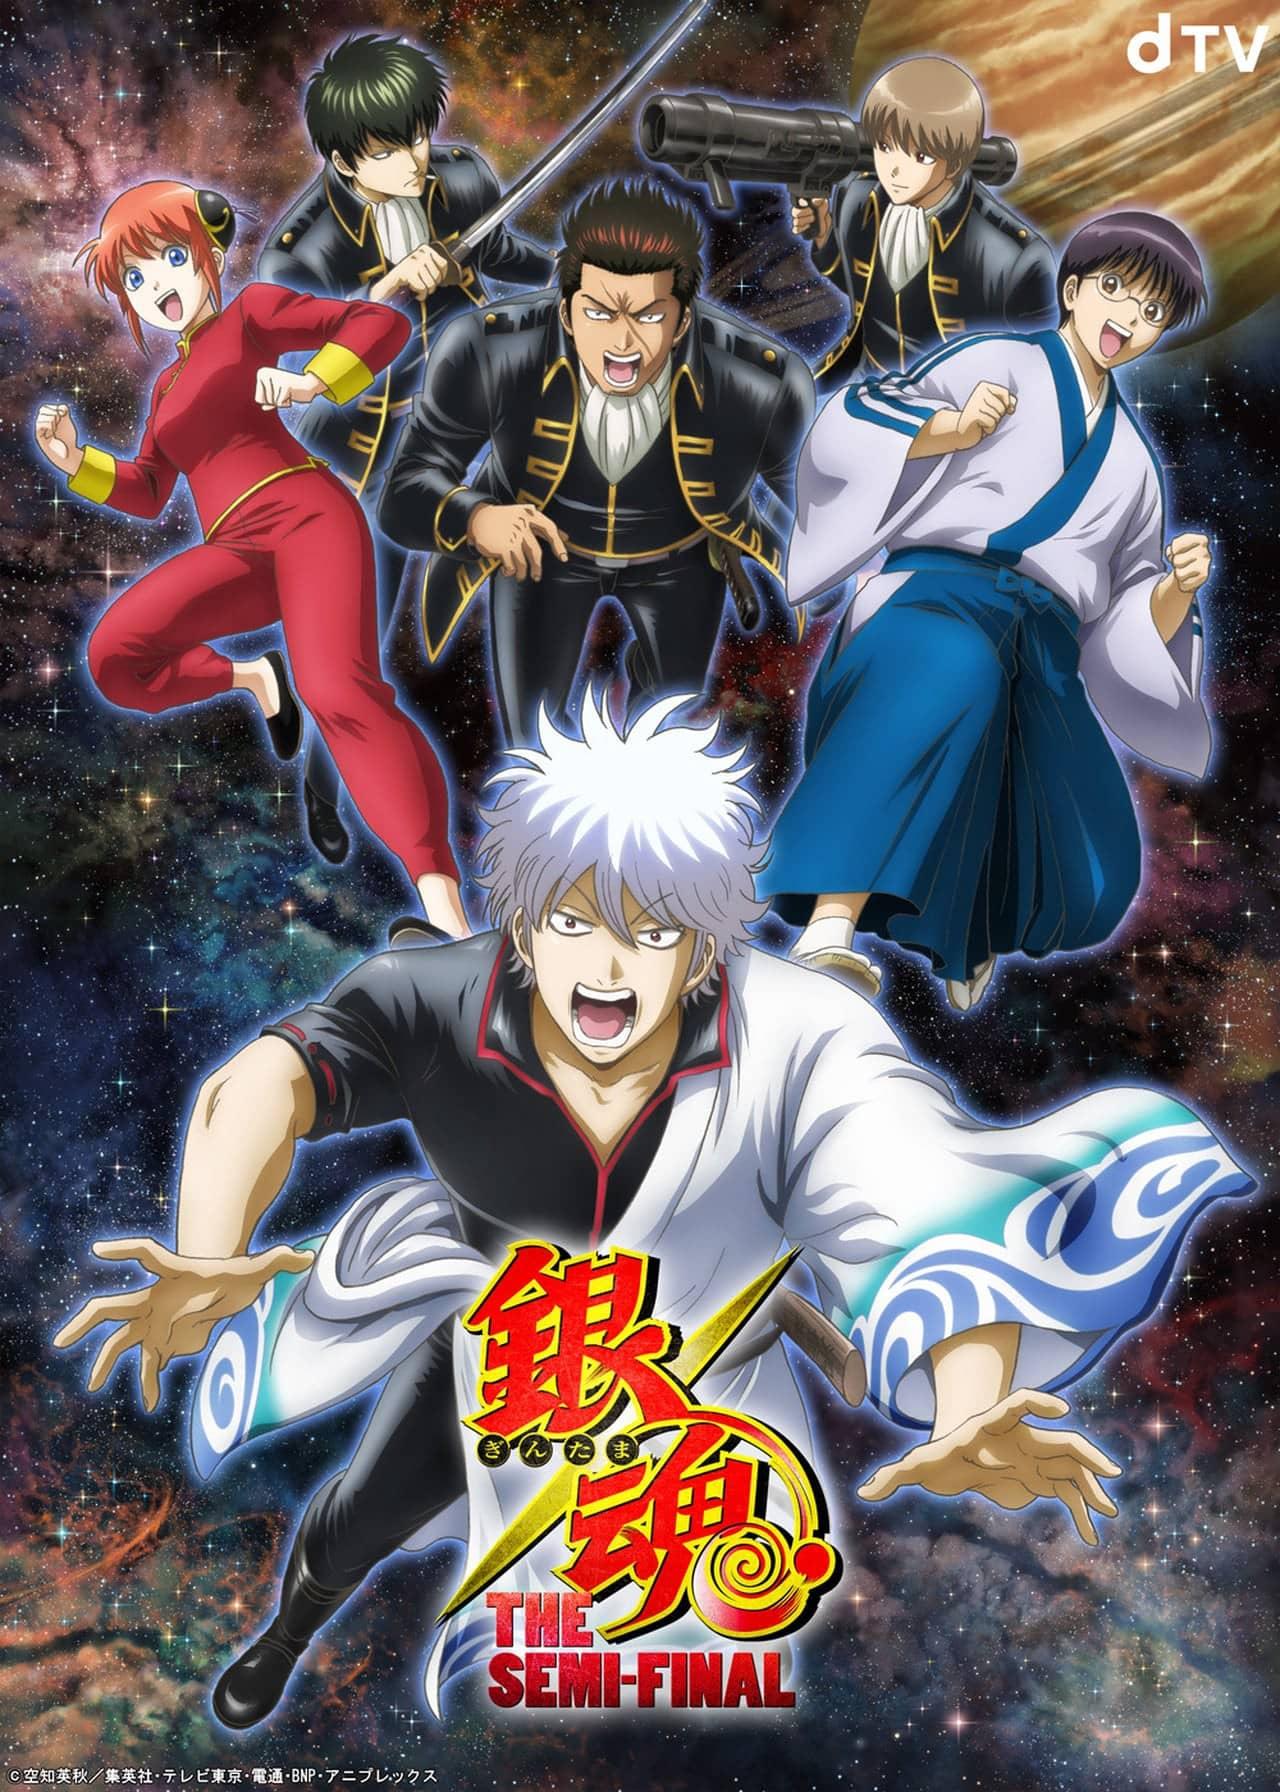 Gintama The Semi-Final promo